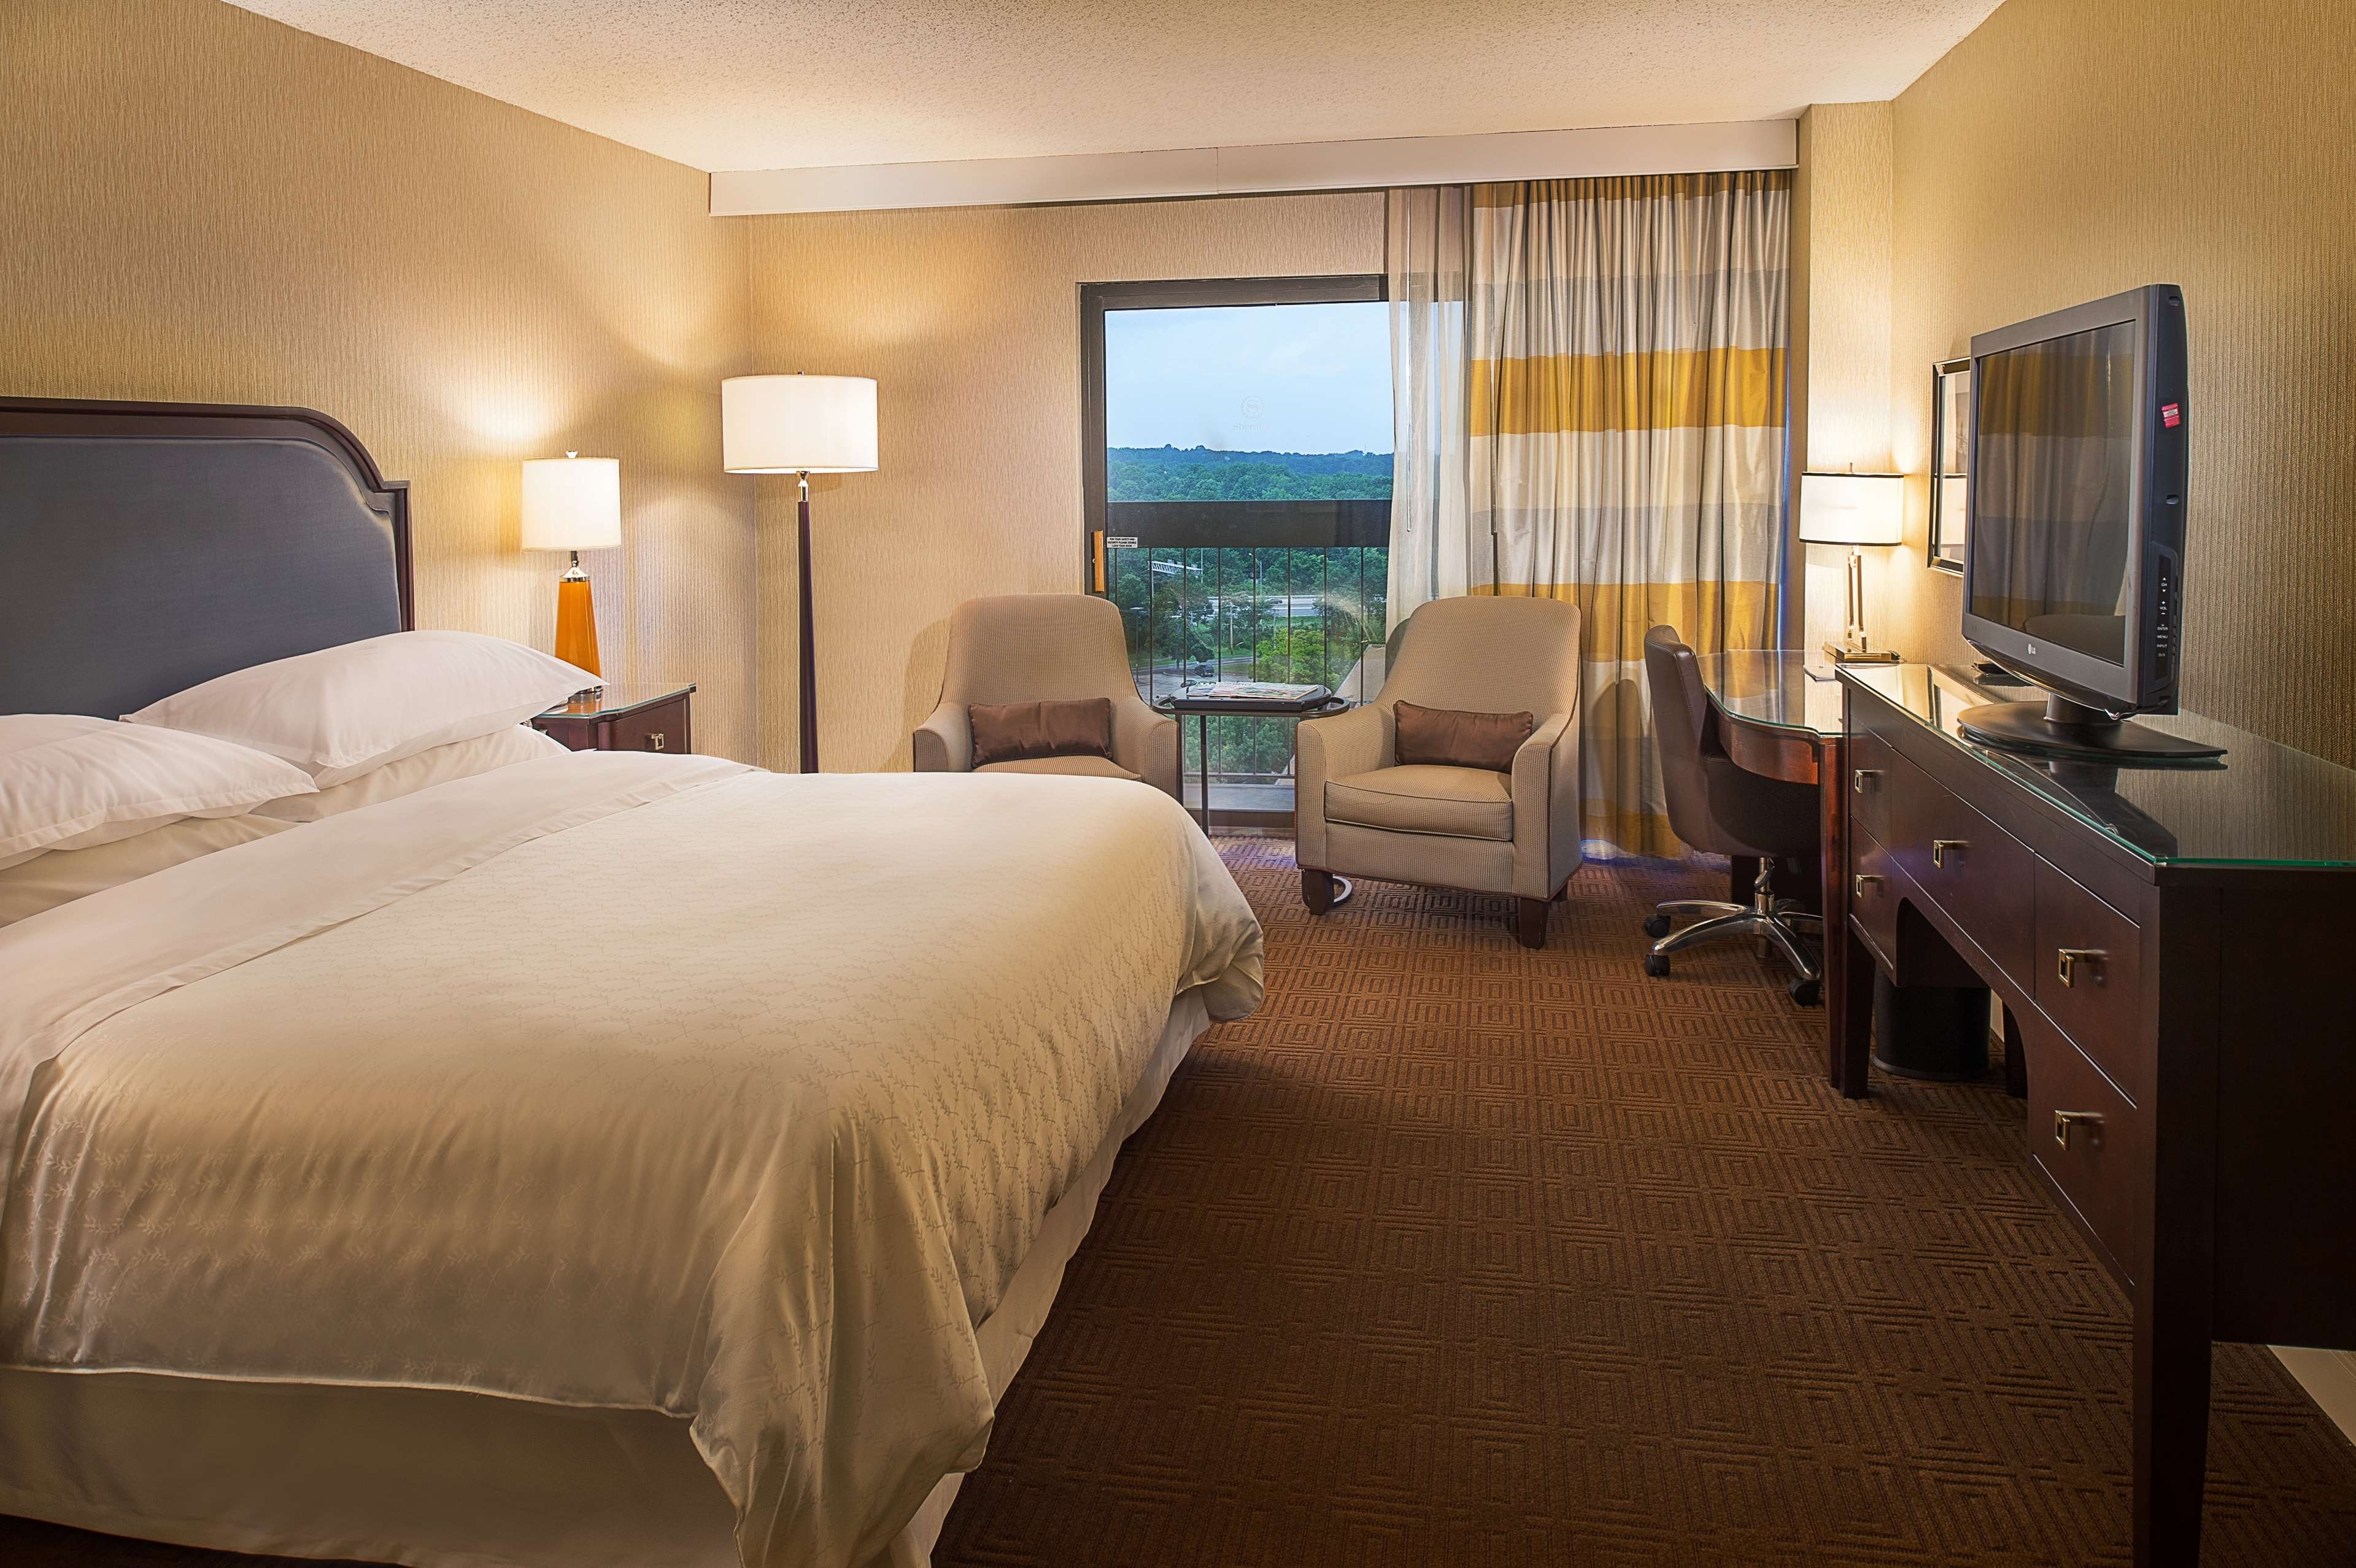 Sheraton Westport Plaza Hotel St. Louis image 23